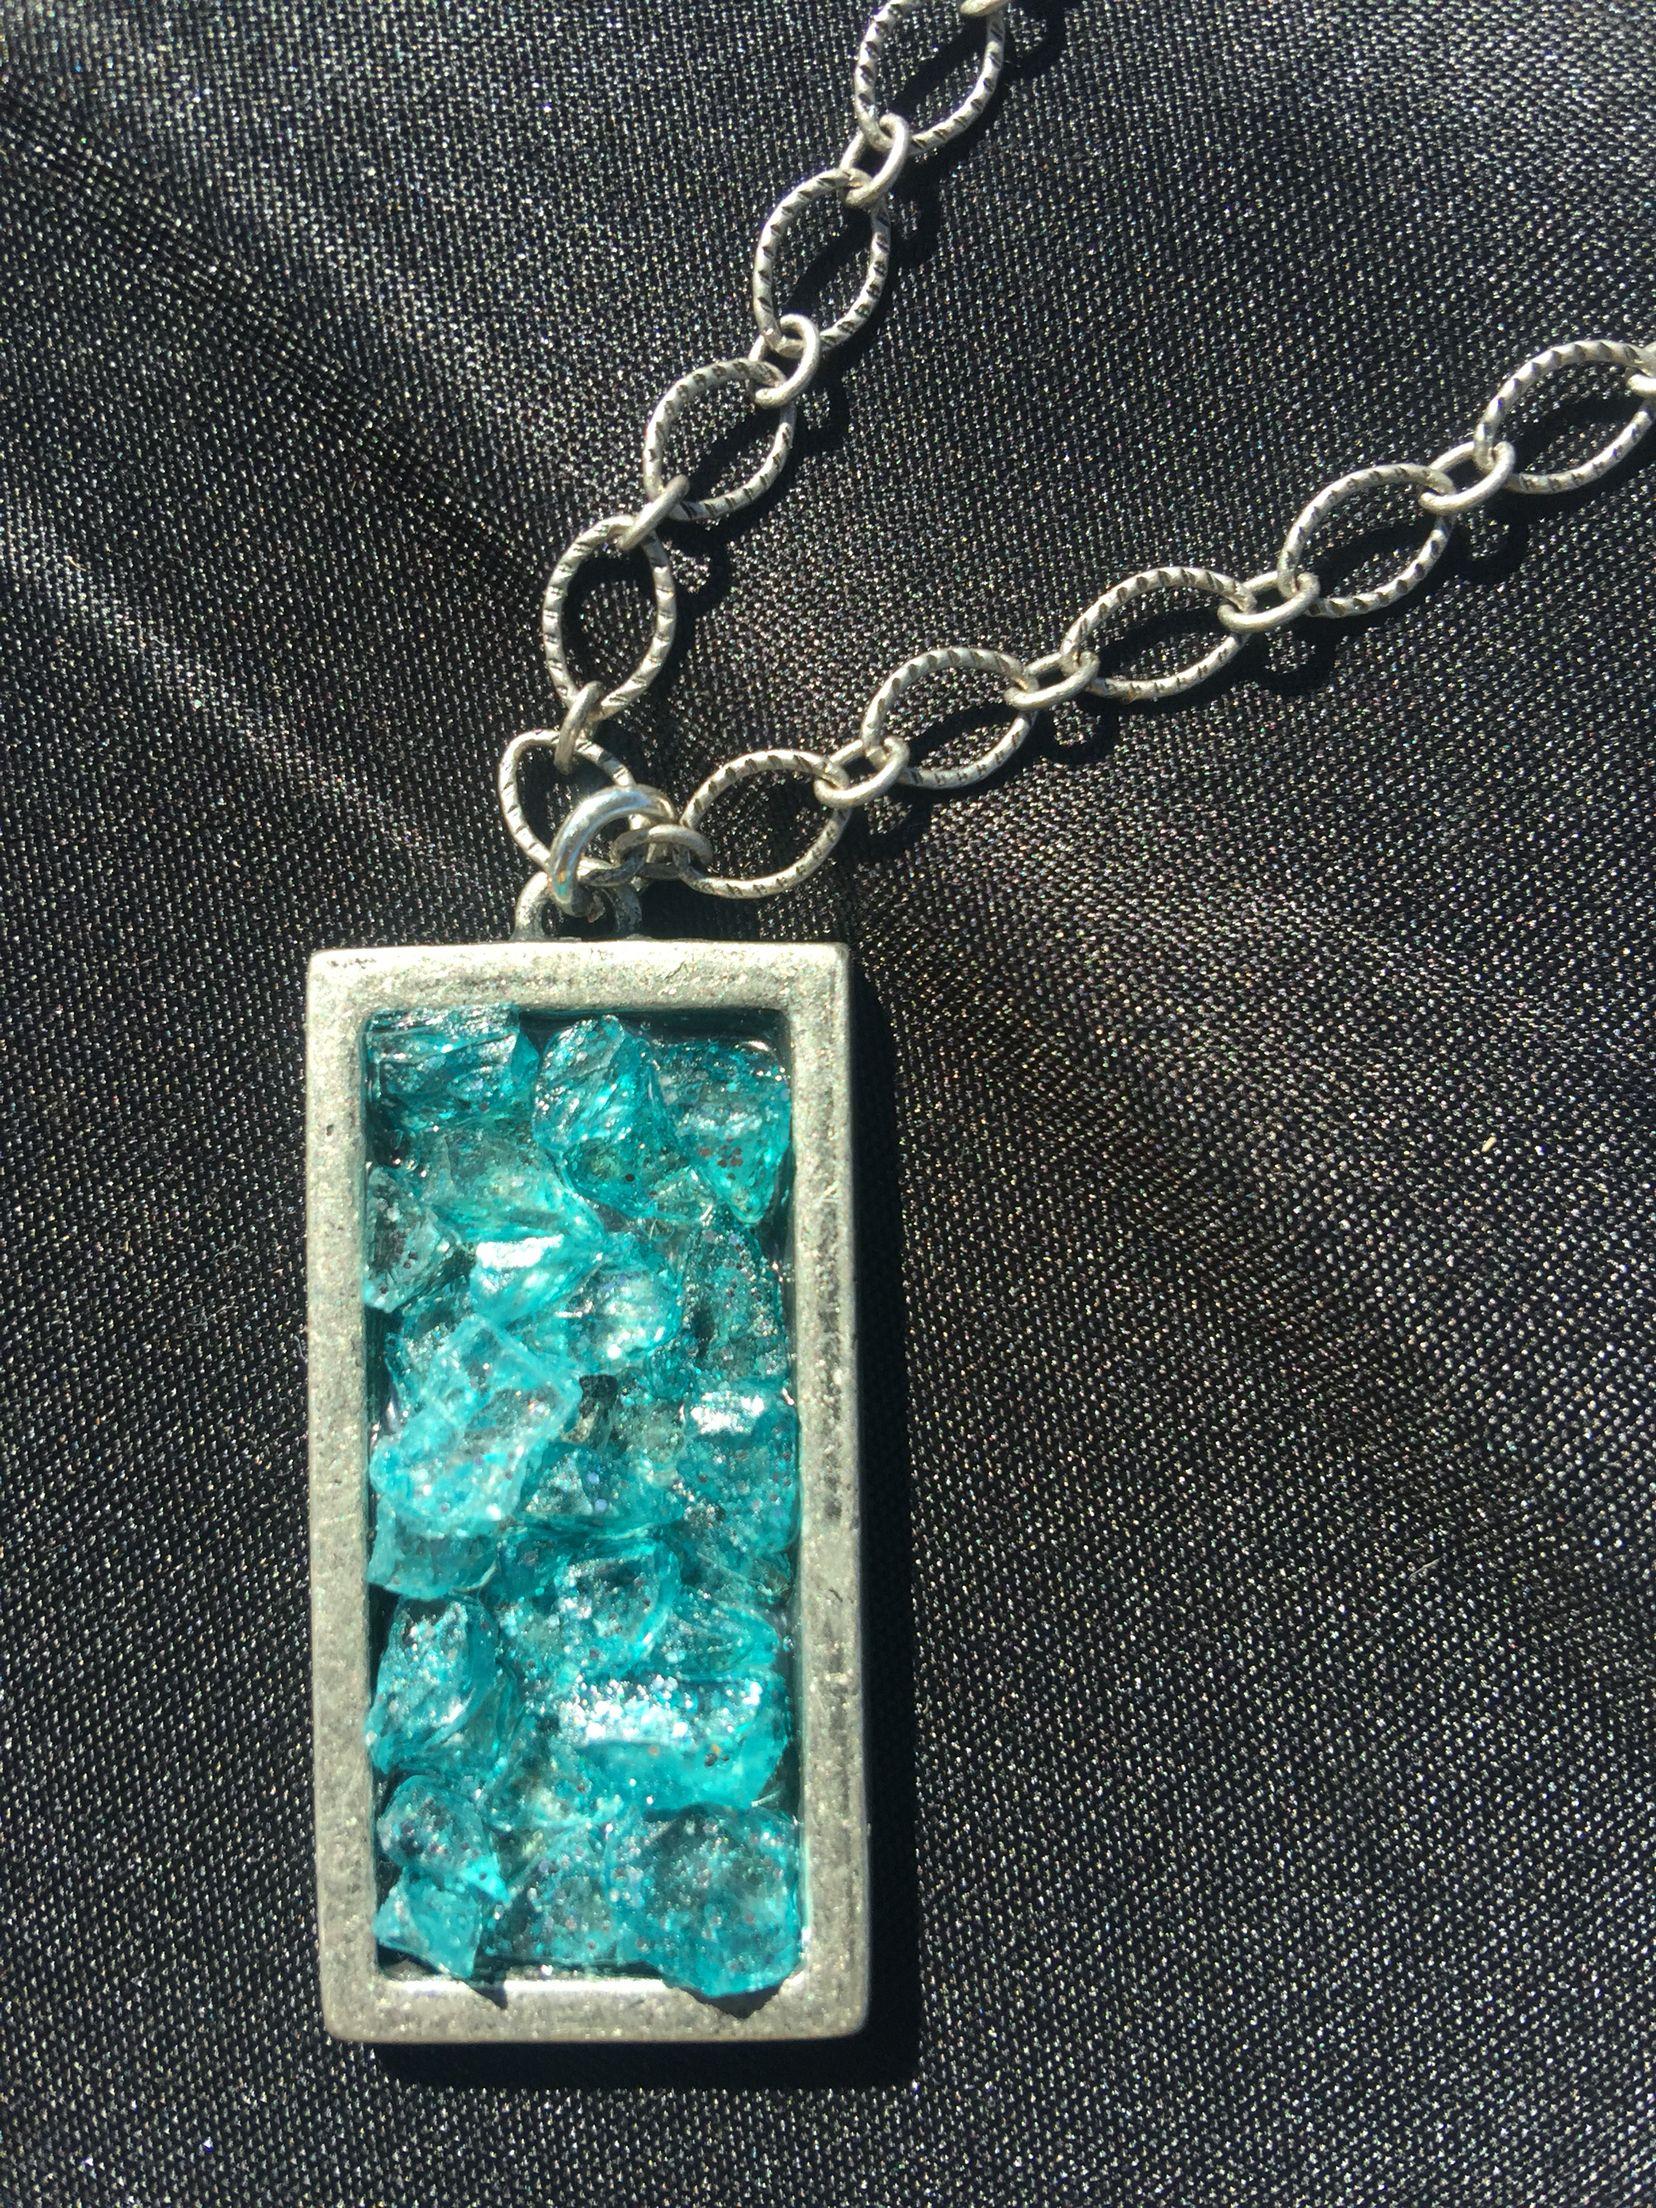 Turquoise broken glass on silver rectangular pendant broken glass turquoise broken glass on silver rectangular pendant aloadofball Images